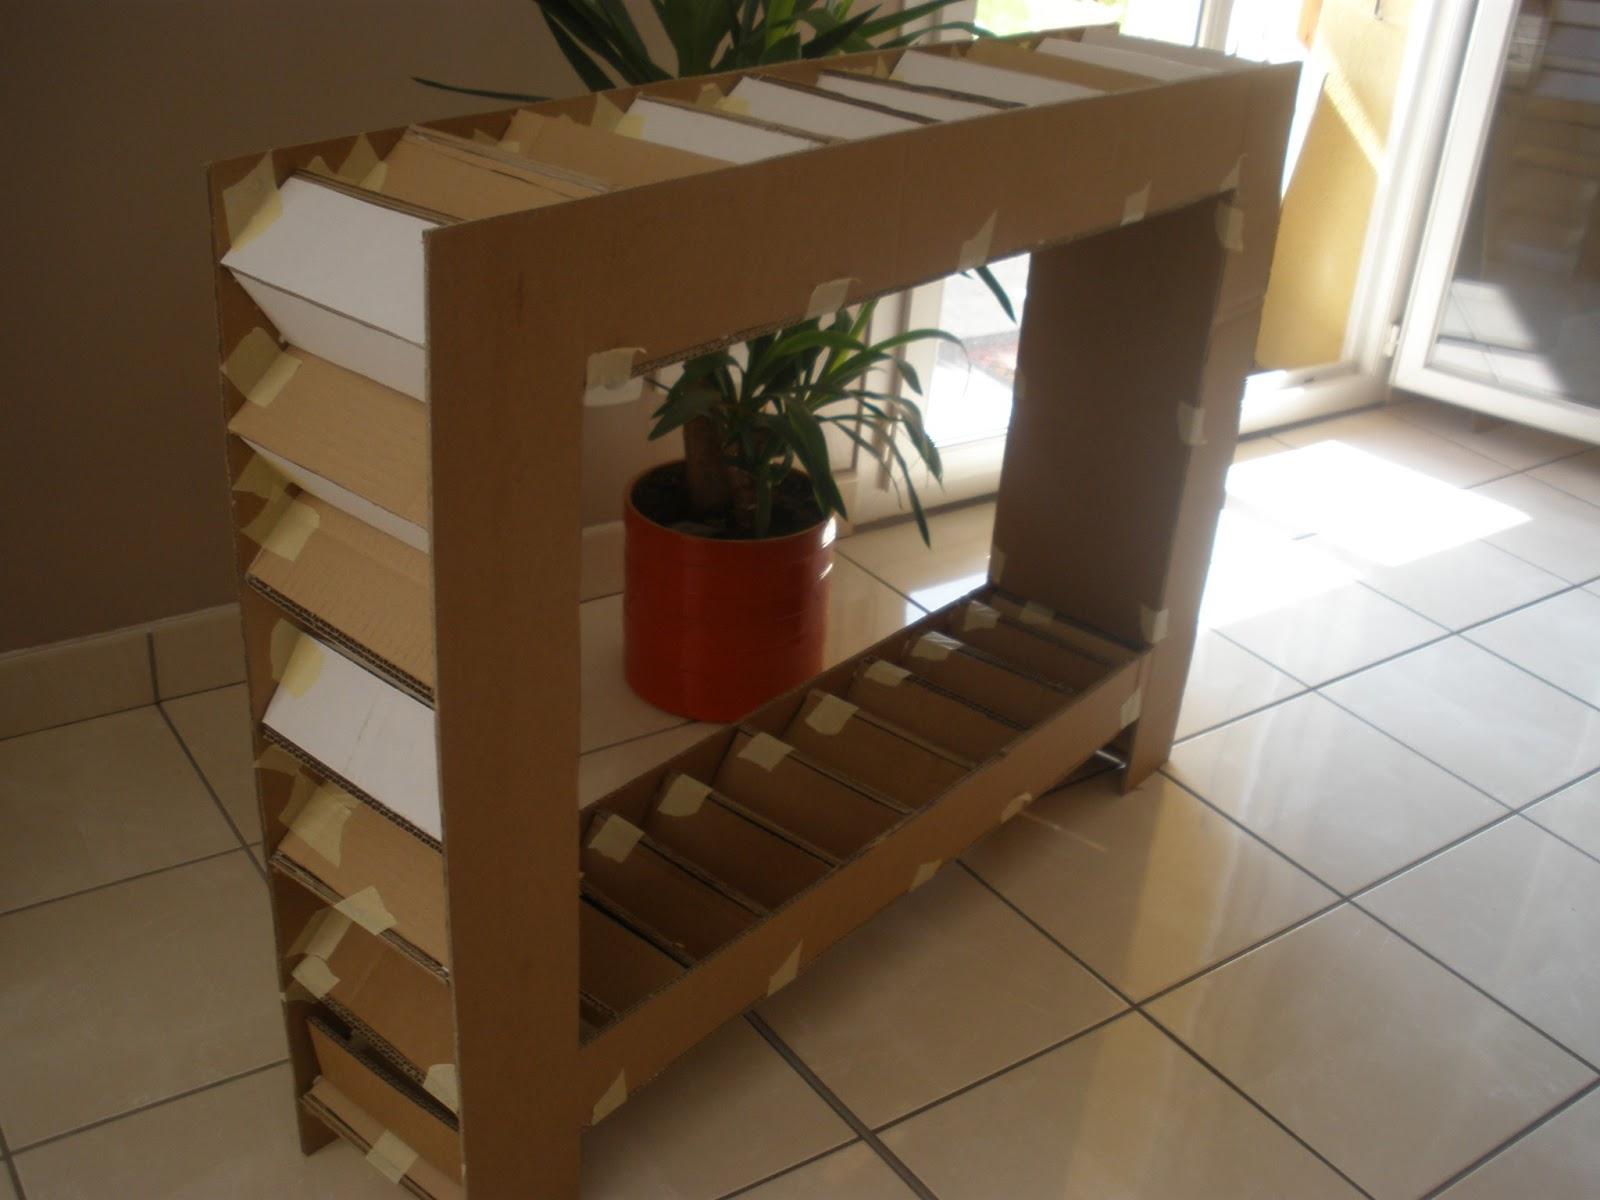 ces temps carton les consoles. Black Bedroom Furniture Sets. Home Design Ideas